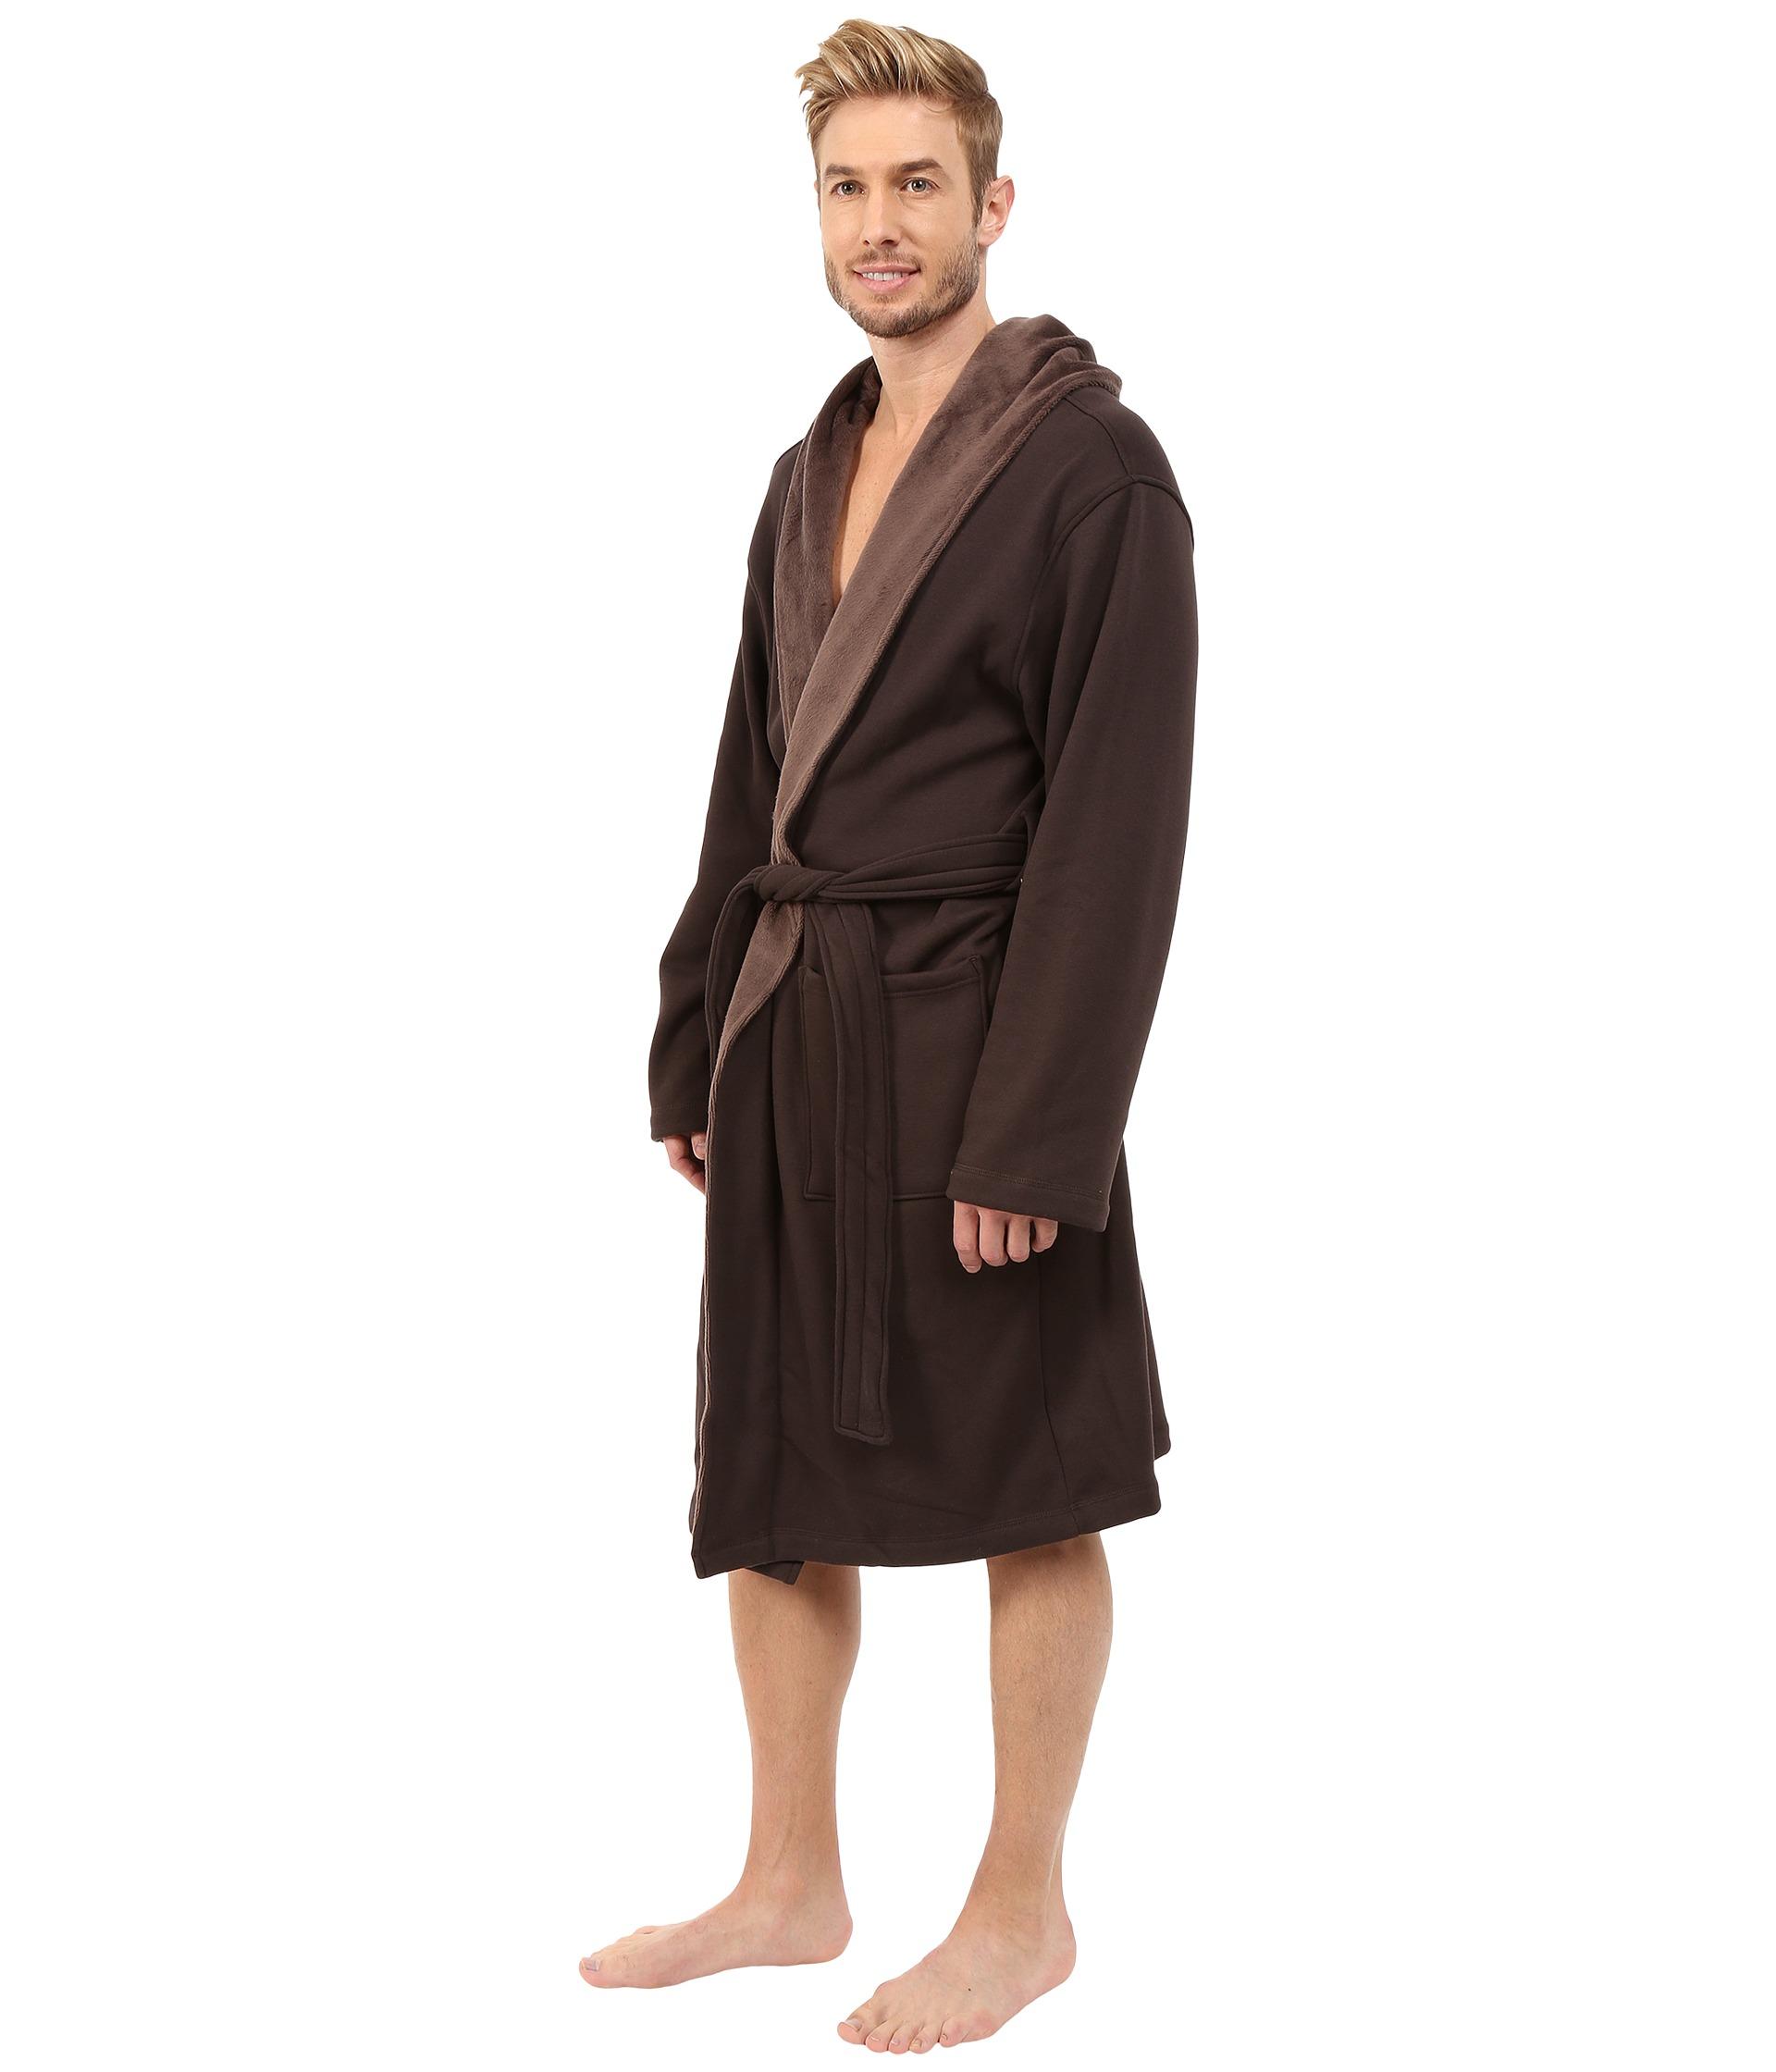 Robe Australia: Ugg Brunswick Robe Review